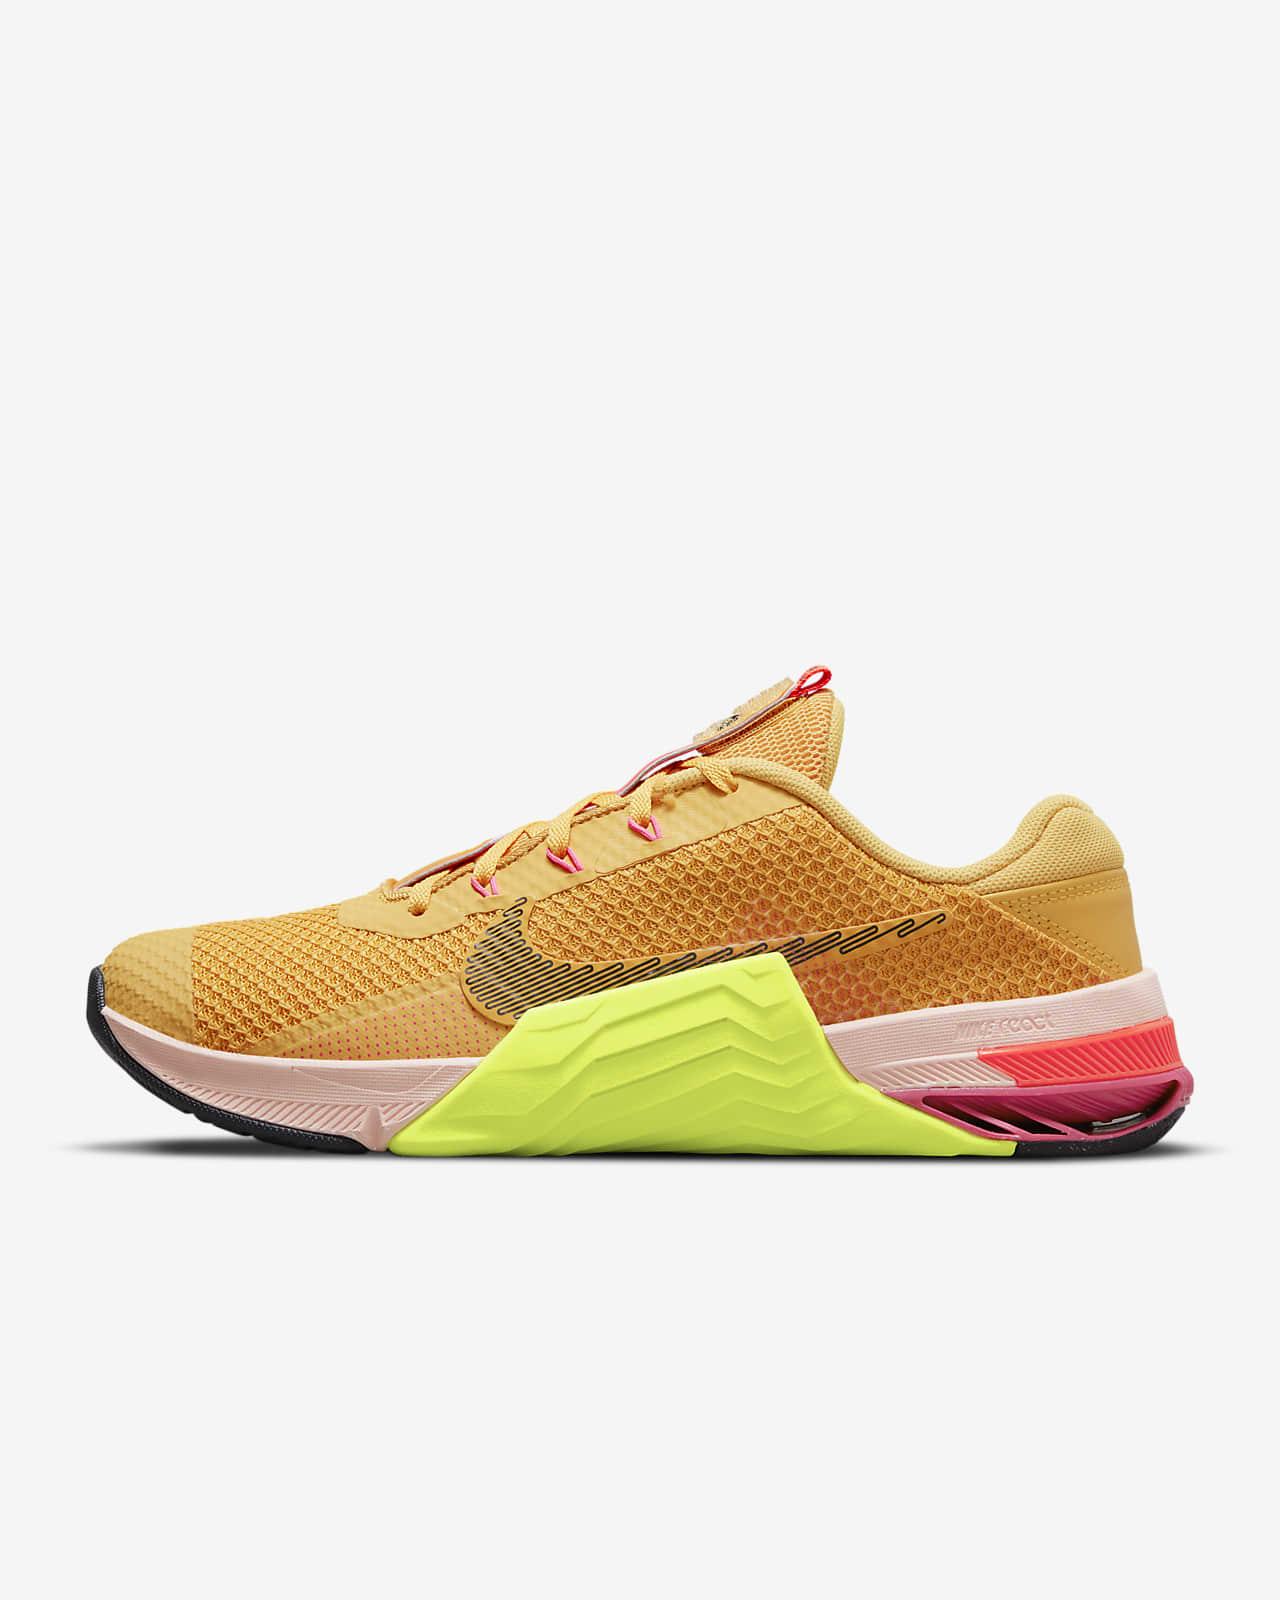 Nike Metcon 7 X Training Shoe